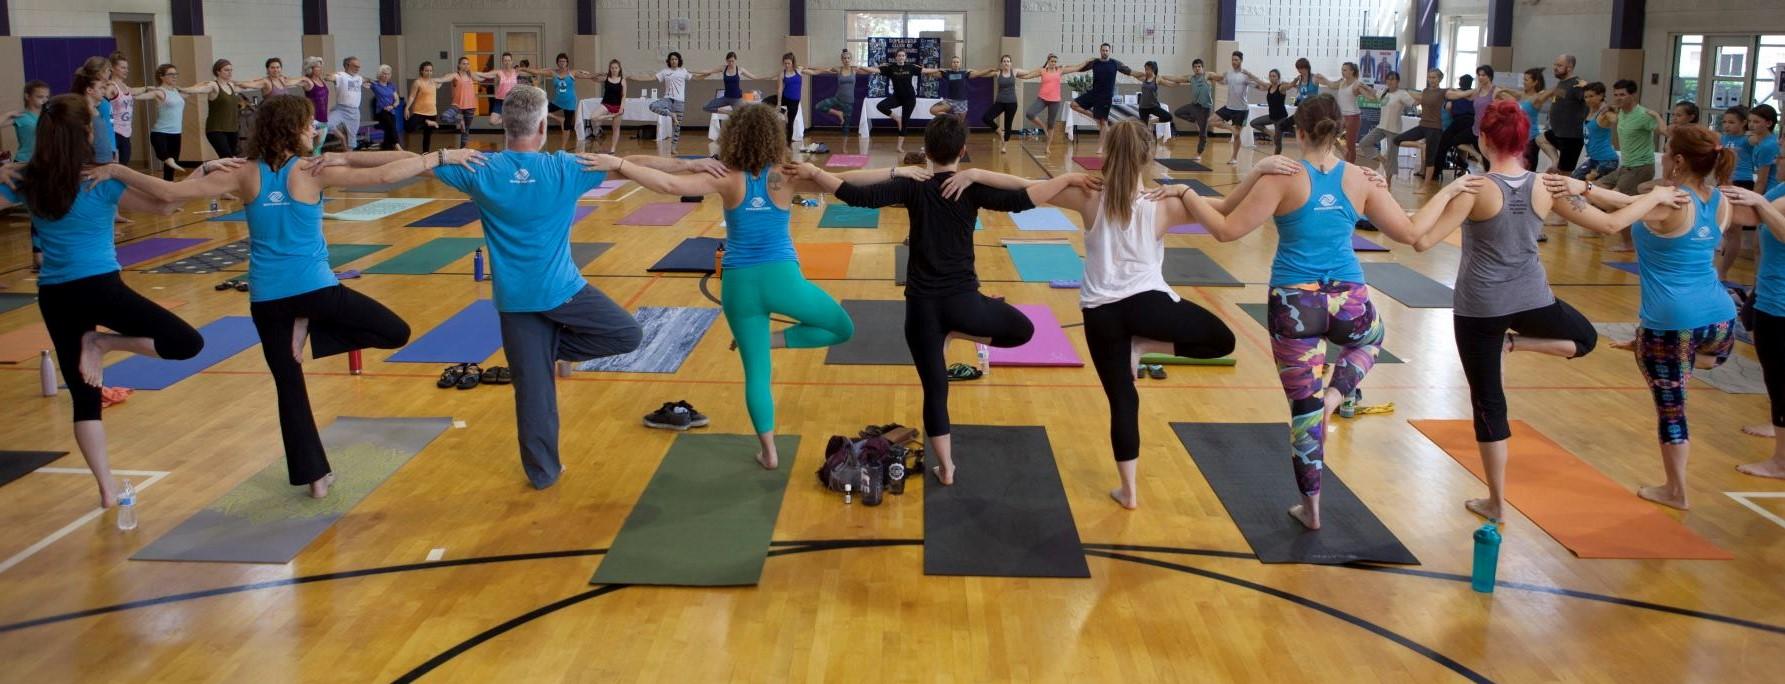 yoga fest circle cropped